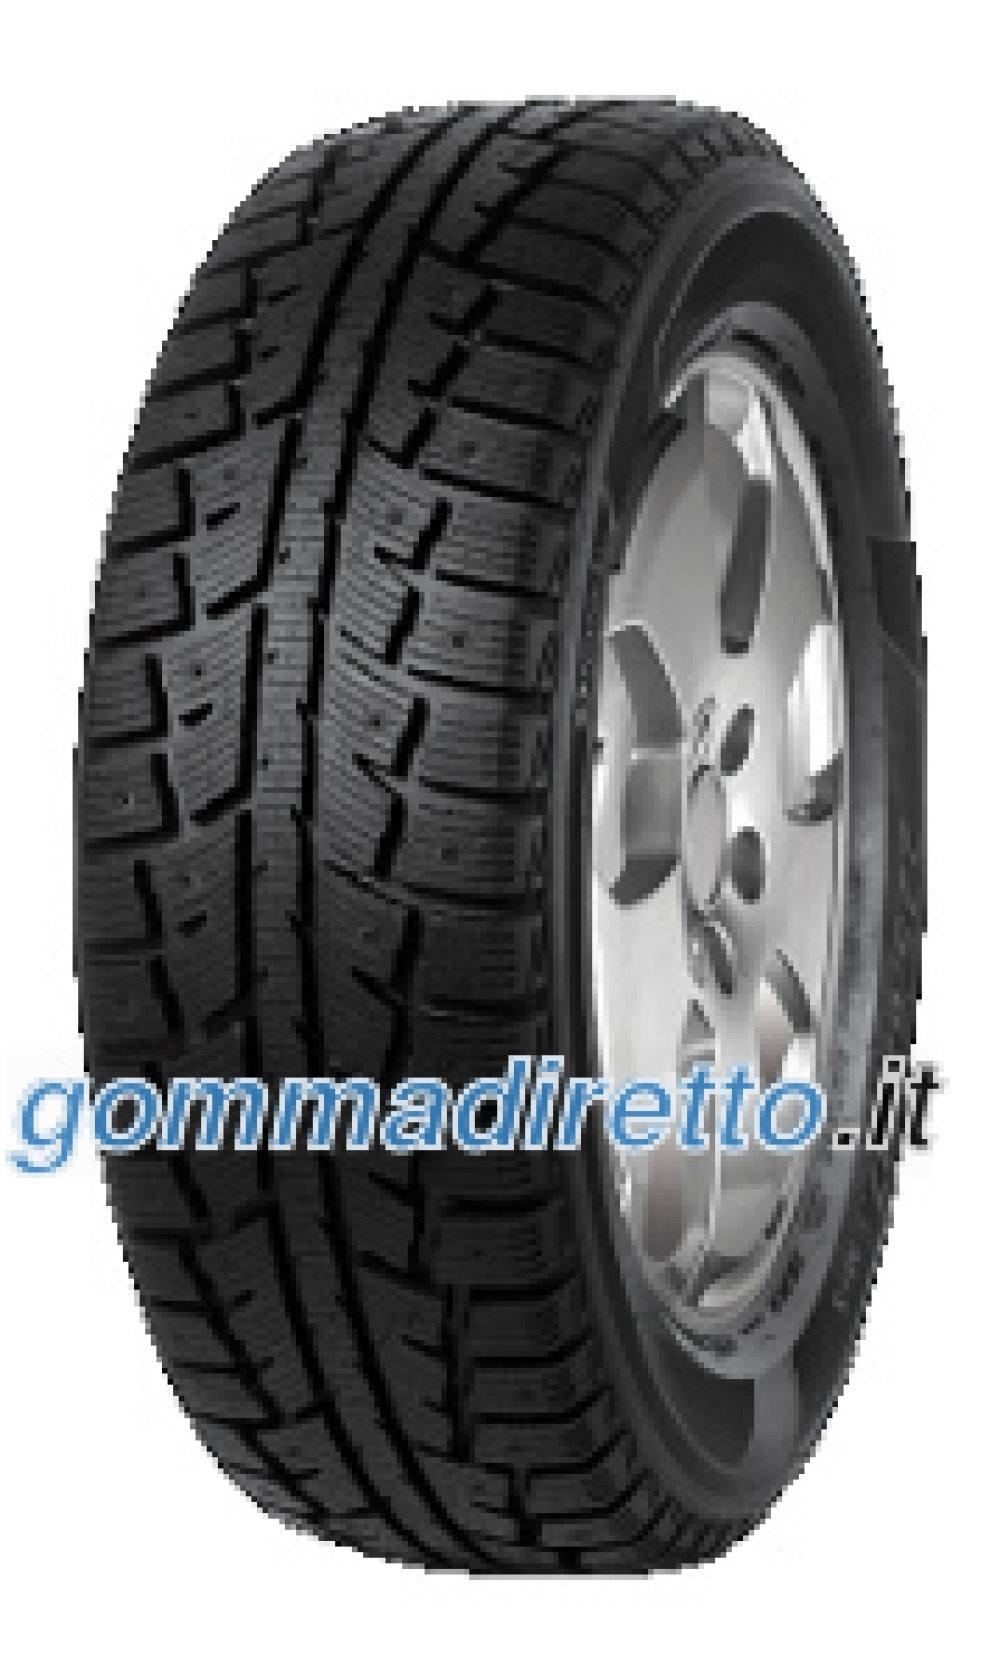 Image of Imperial Eco North SUV ( 235/55 R18 104H XL pneumatico chiodato )